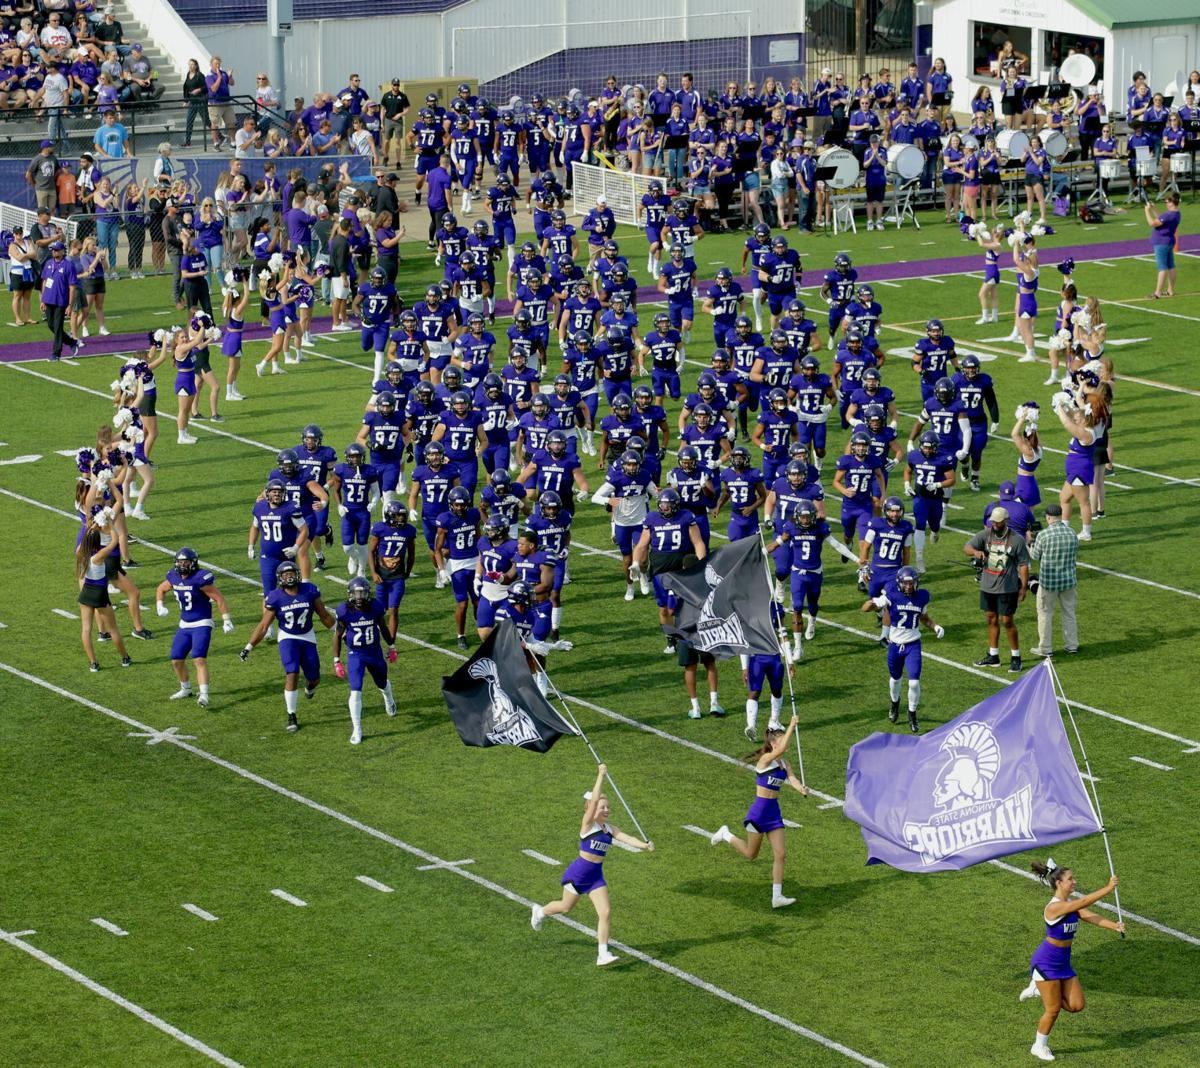 Photos: WSU Homecoming vs Northern State